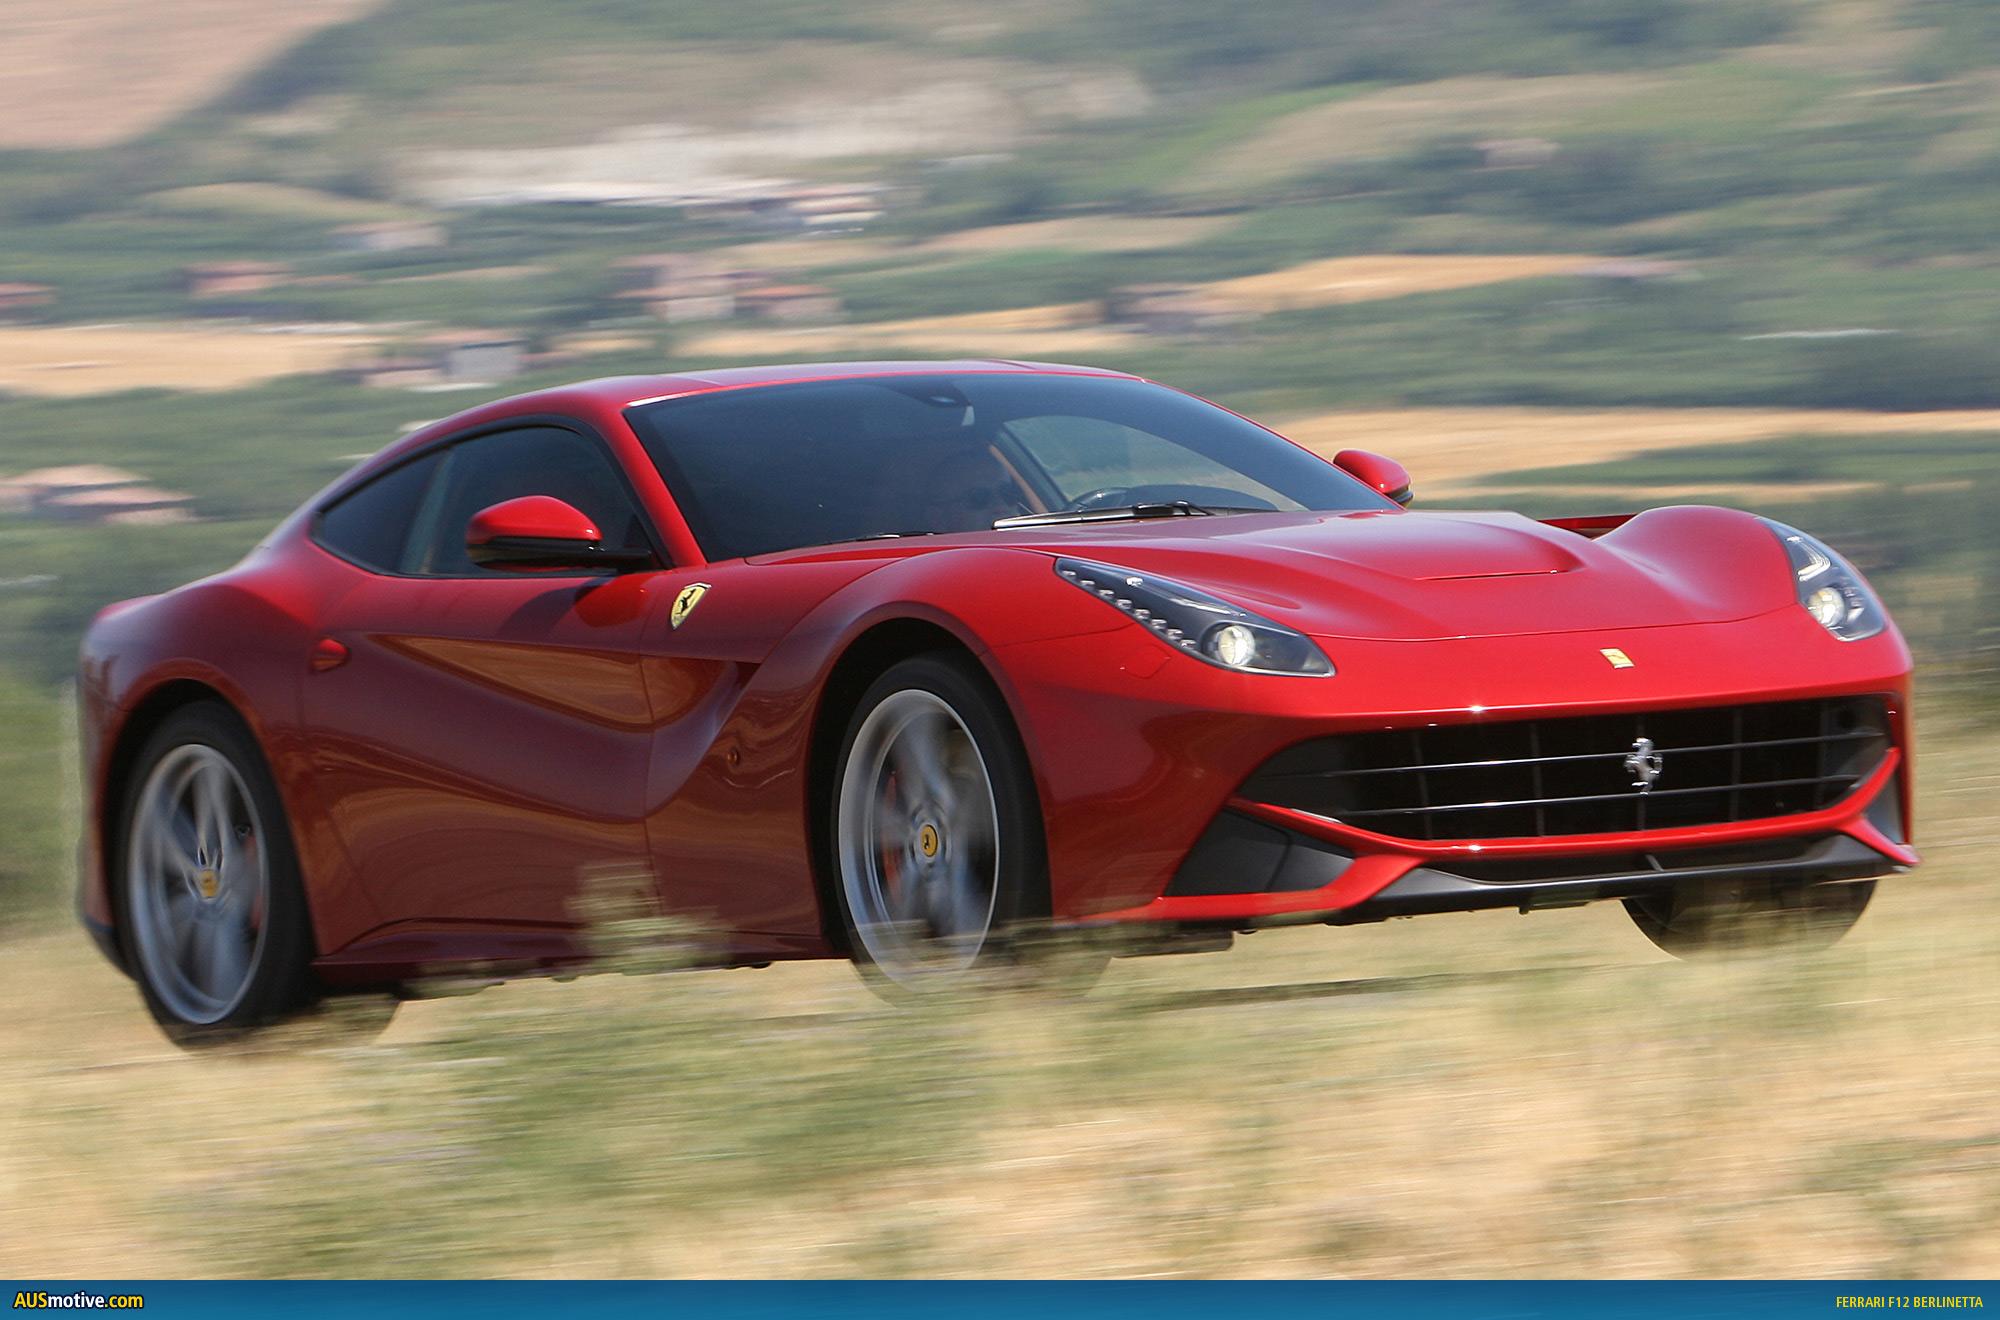 Berlin Wallpaper Hd Ausmotive Com 187 Ferrari F12 Berlinetta Australian Pricing